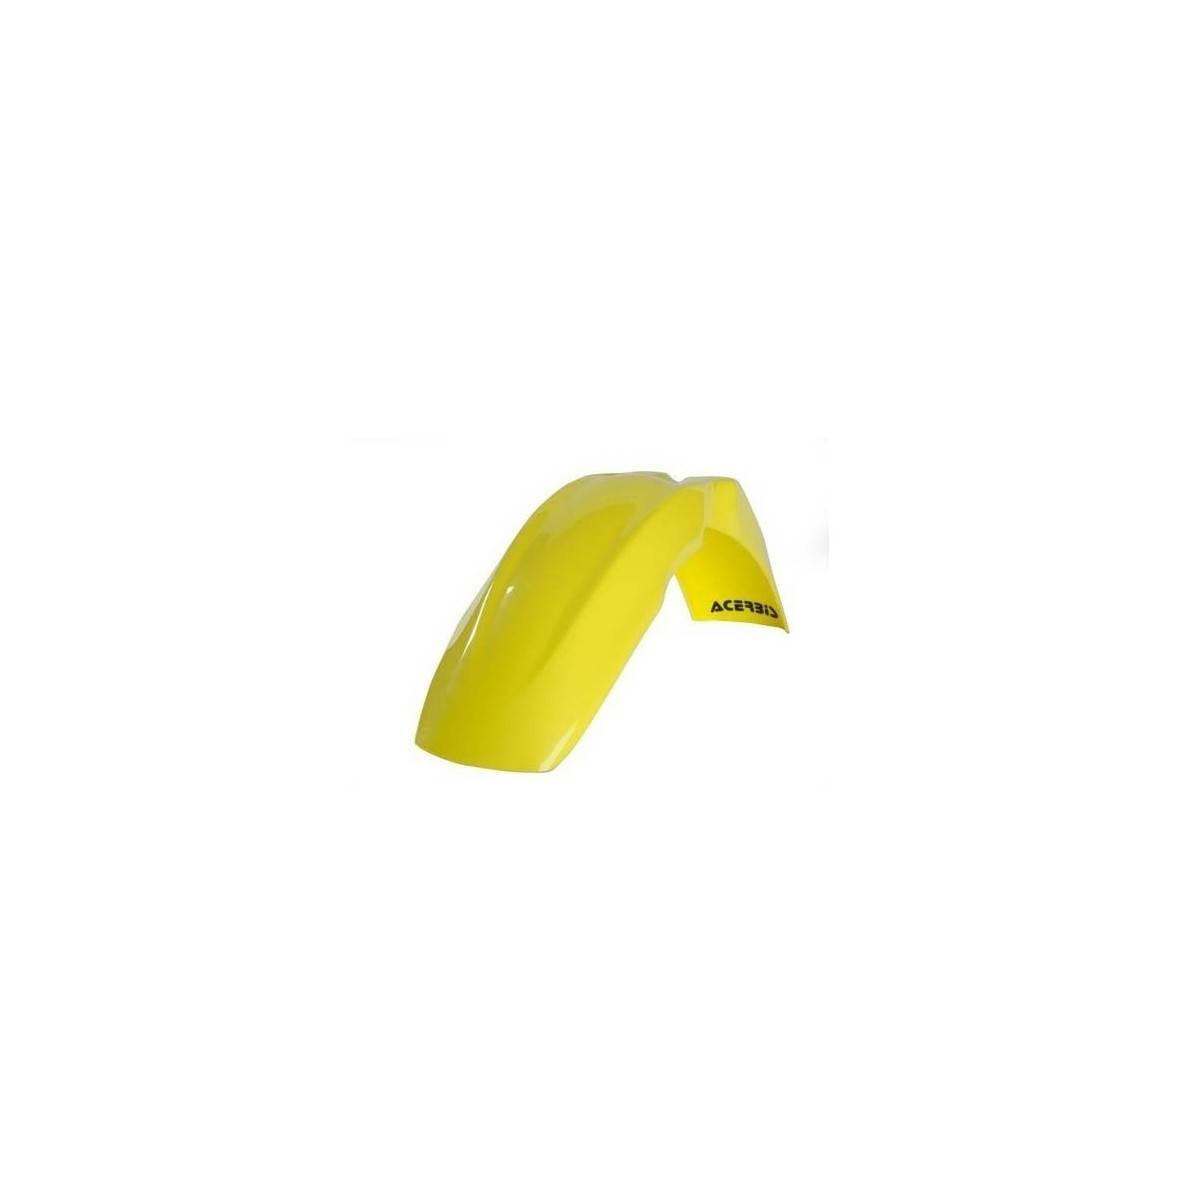 0011642-061 - Guardabarros Delantero Suzuki 10 18 Amarillo Fluor